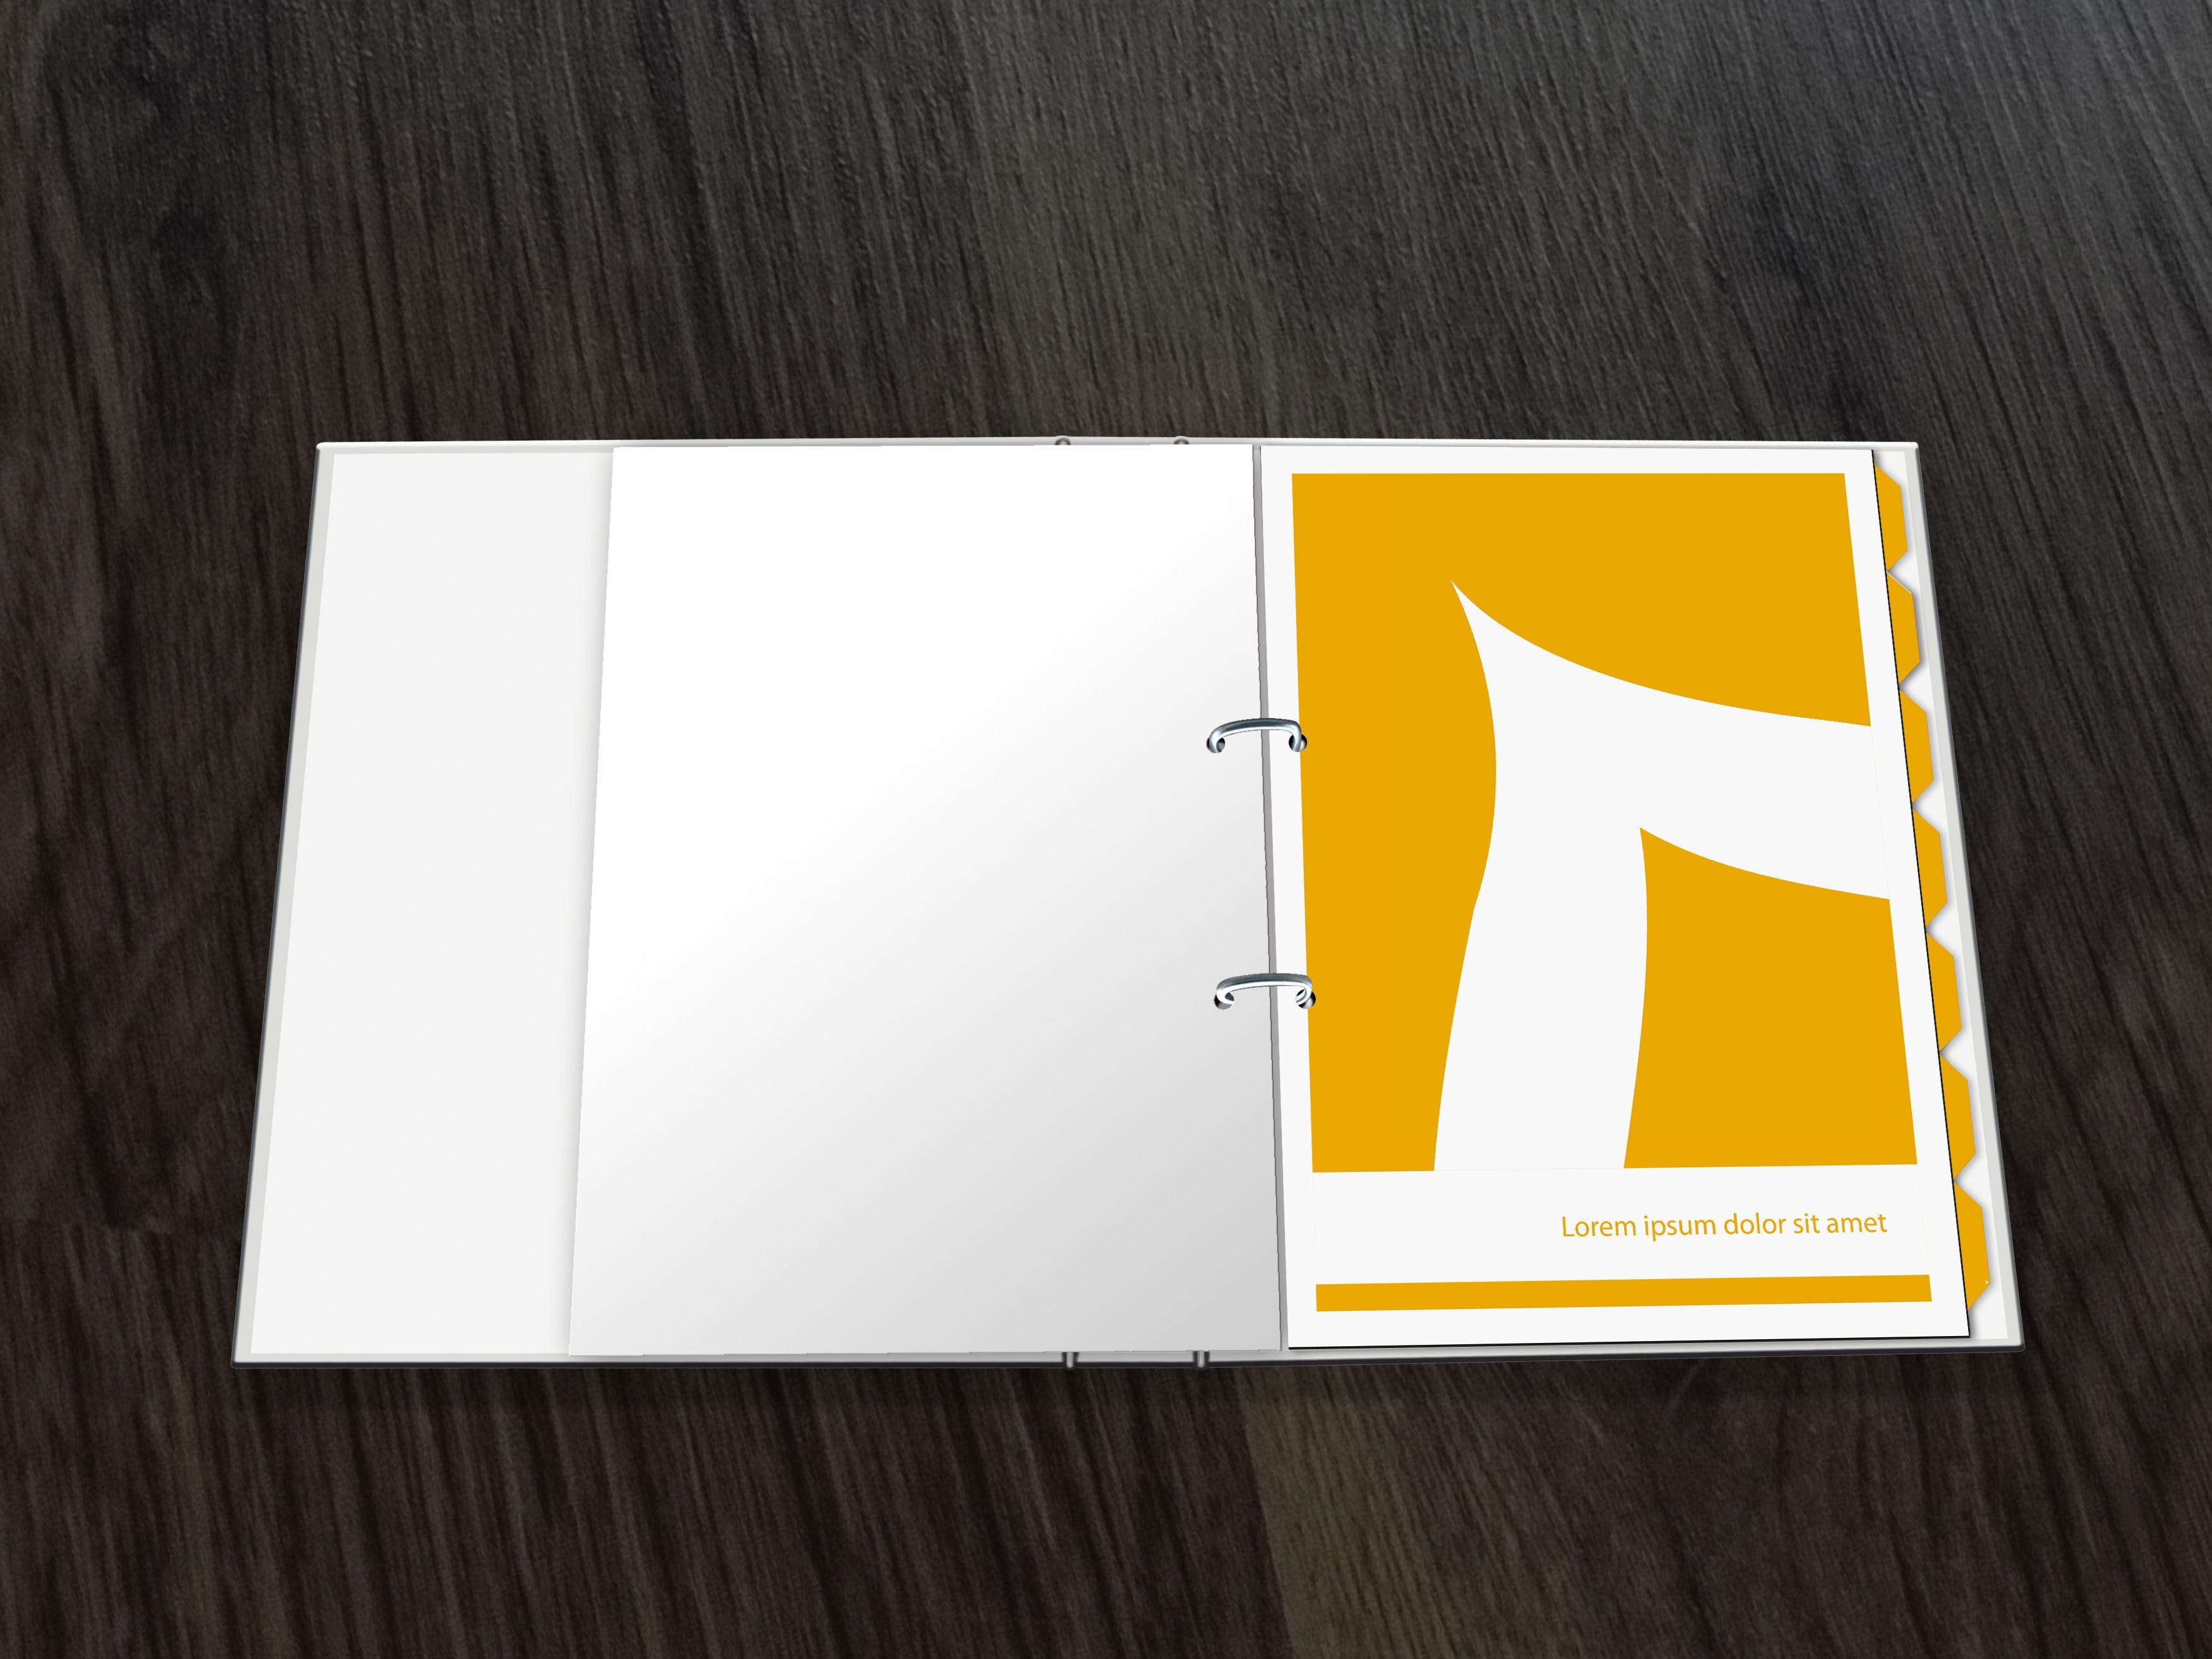 submittel folder - main dividers